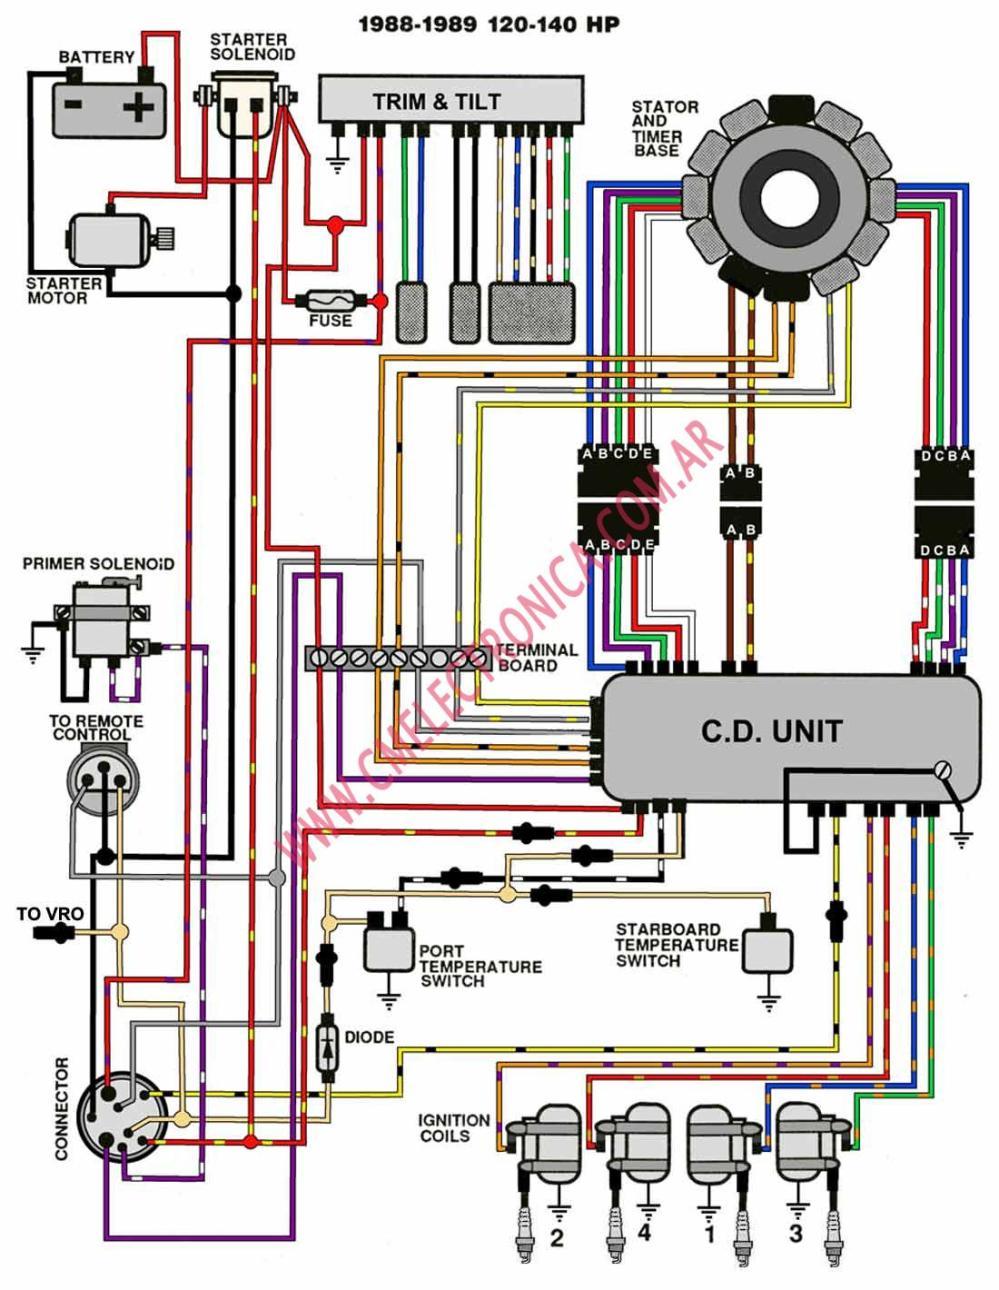 medium resolution of wiring diagram for 98 seadoo spx 97 seadoo spx wiring diagram elsalvadorla 1996 seadoo xp 800